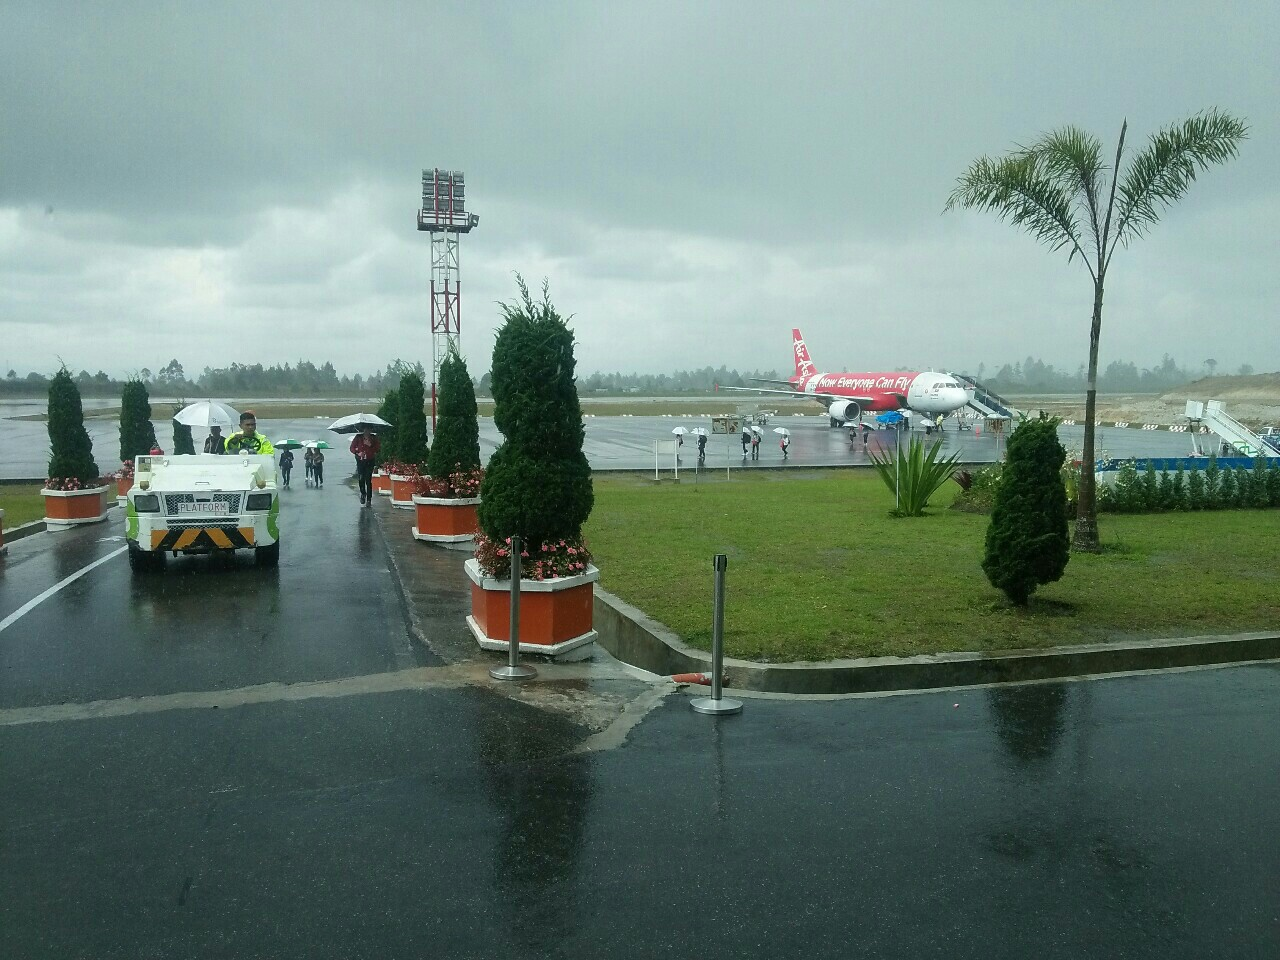 Maskapai Air Asia  menghentikan sementara rute Internasional Kuala Lumpur-Silangit mulai 1 Maret 2019.